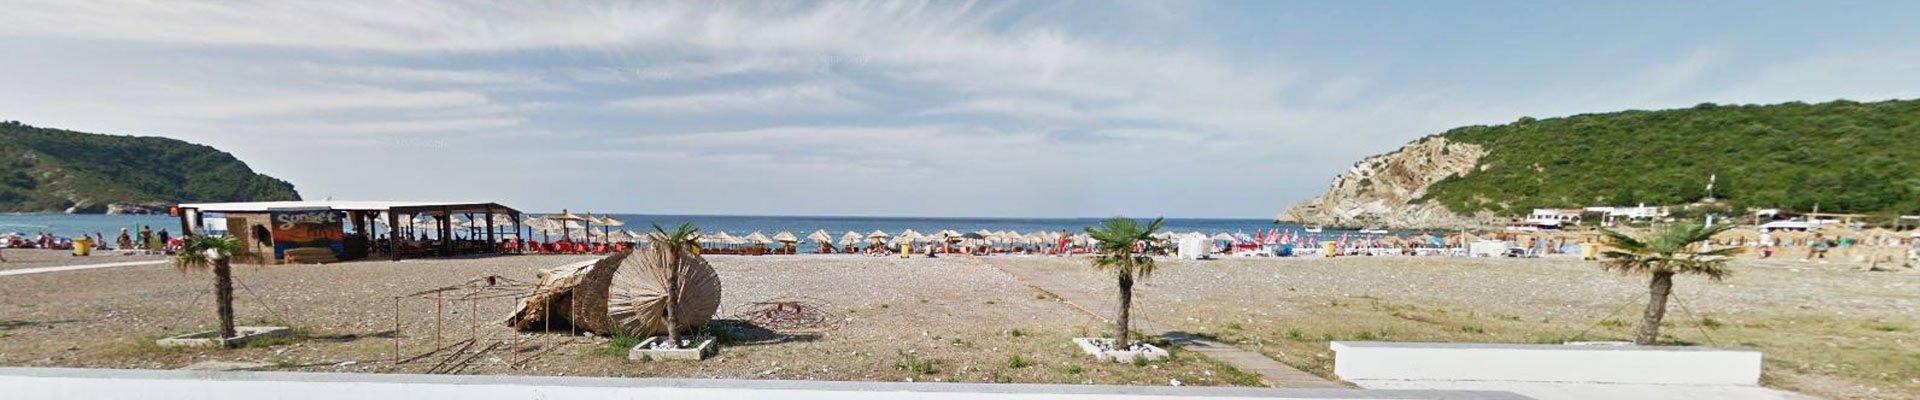 Plaža u Čanju